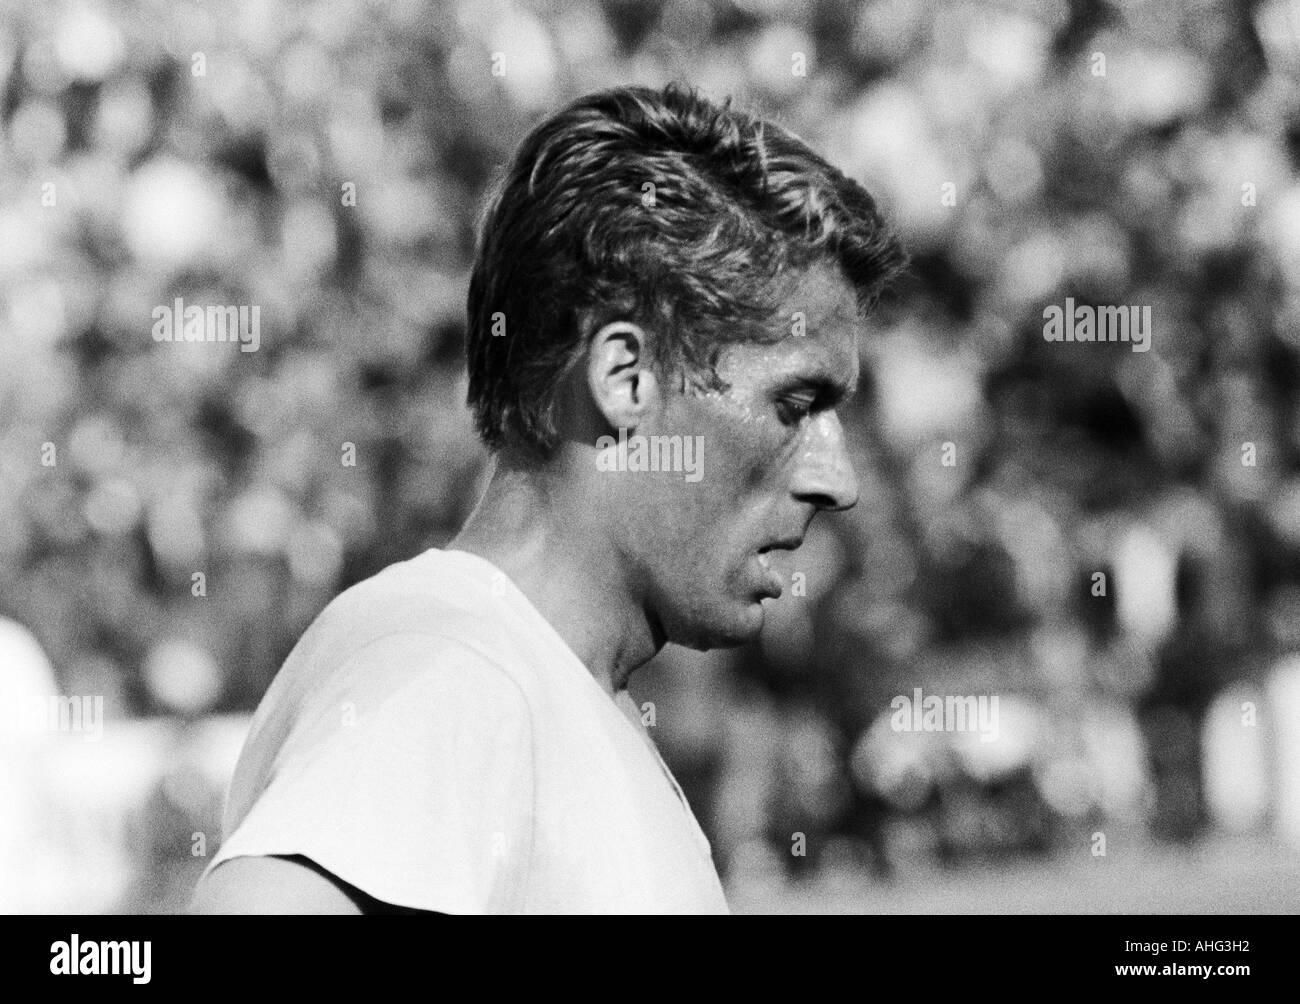 football, Bundesliga, 1966/1967, Stadium at the Hamburger Strasse, Eintracht Brunswick versus Borussia Moenchengladbach 2:1, football player, portrait of Juergen Moll (Braunschweig) - Stock Image